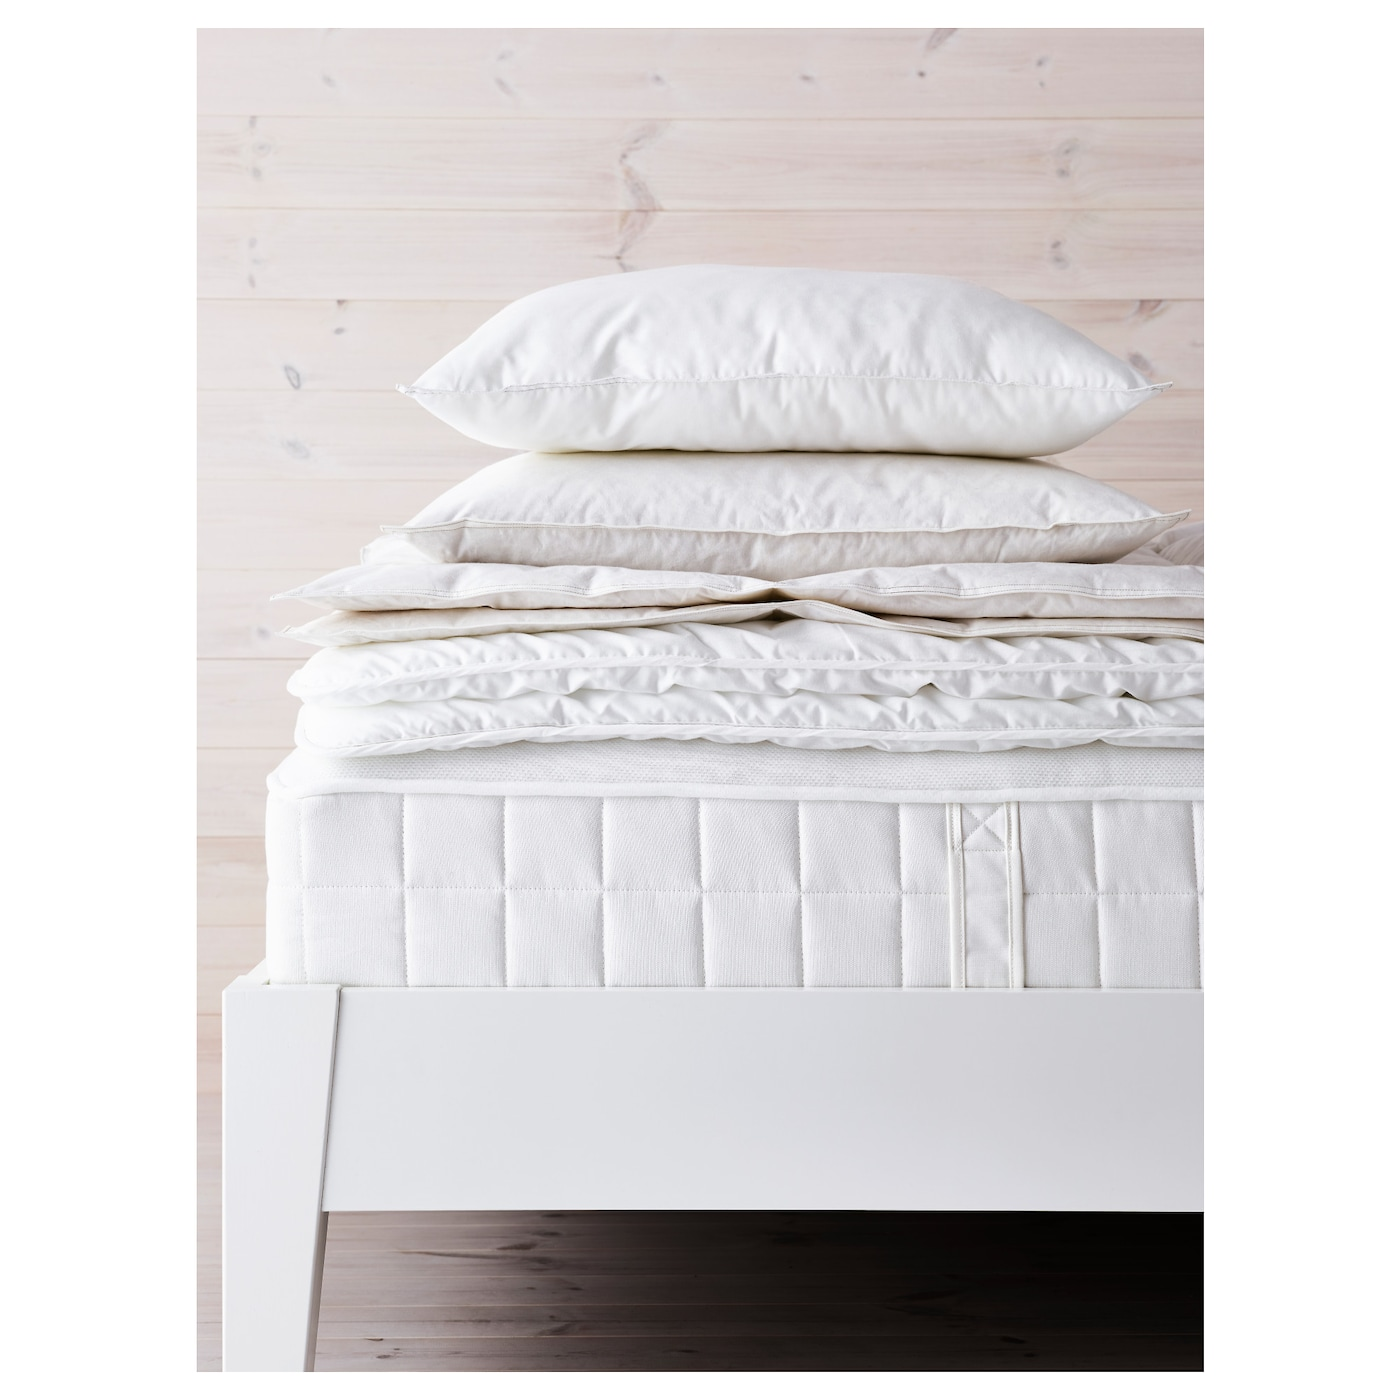 hyllestad matelas ressorts ensach s ferme blanc 90x200. Black Bedroom Furniture Sets. Home Design Ideas